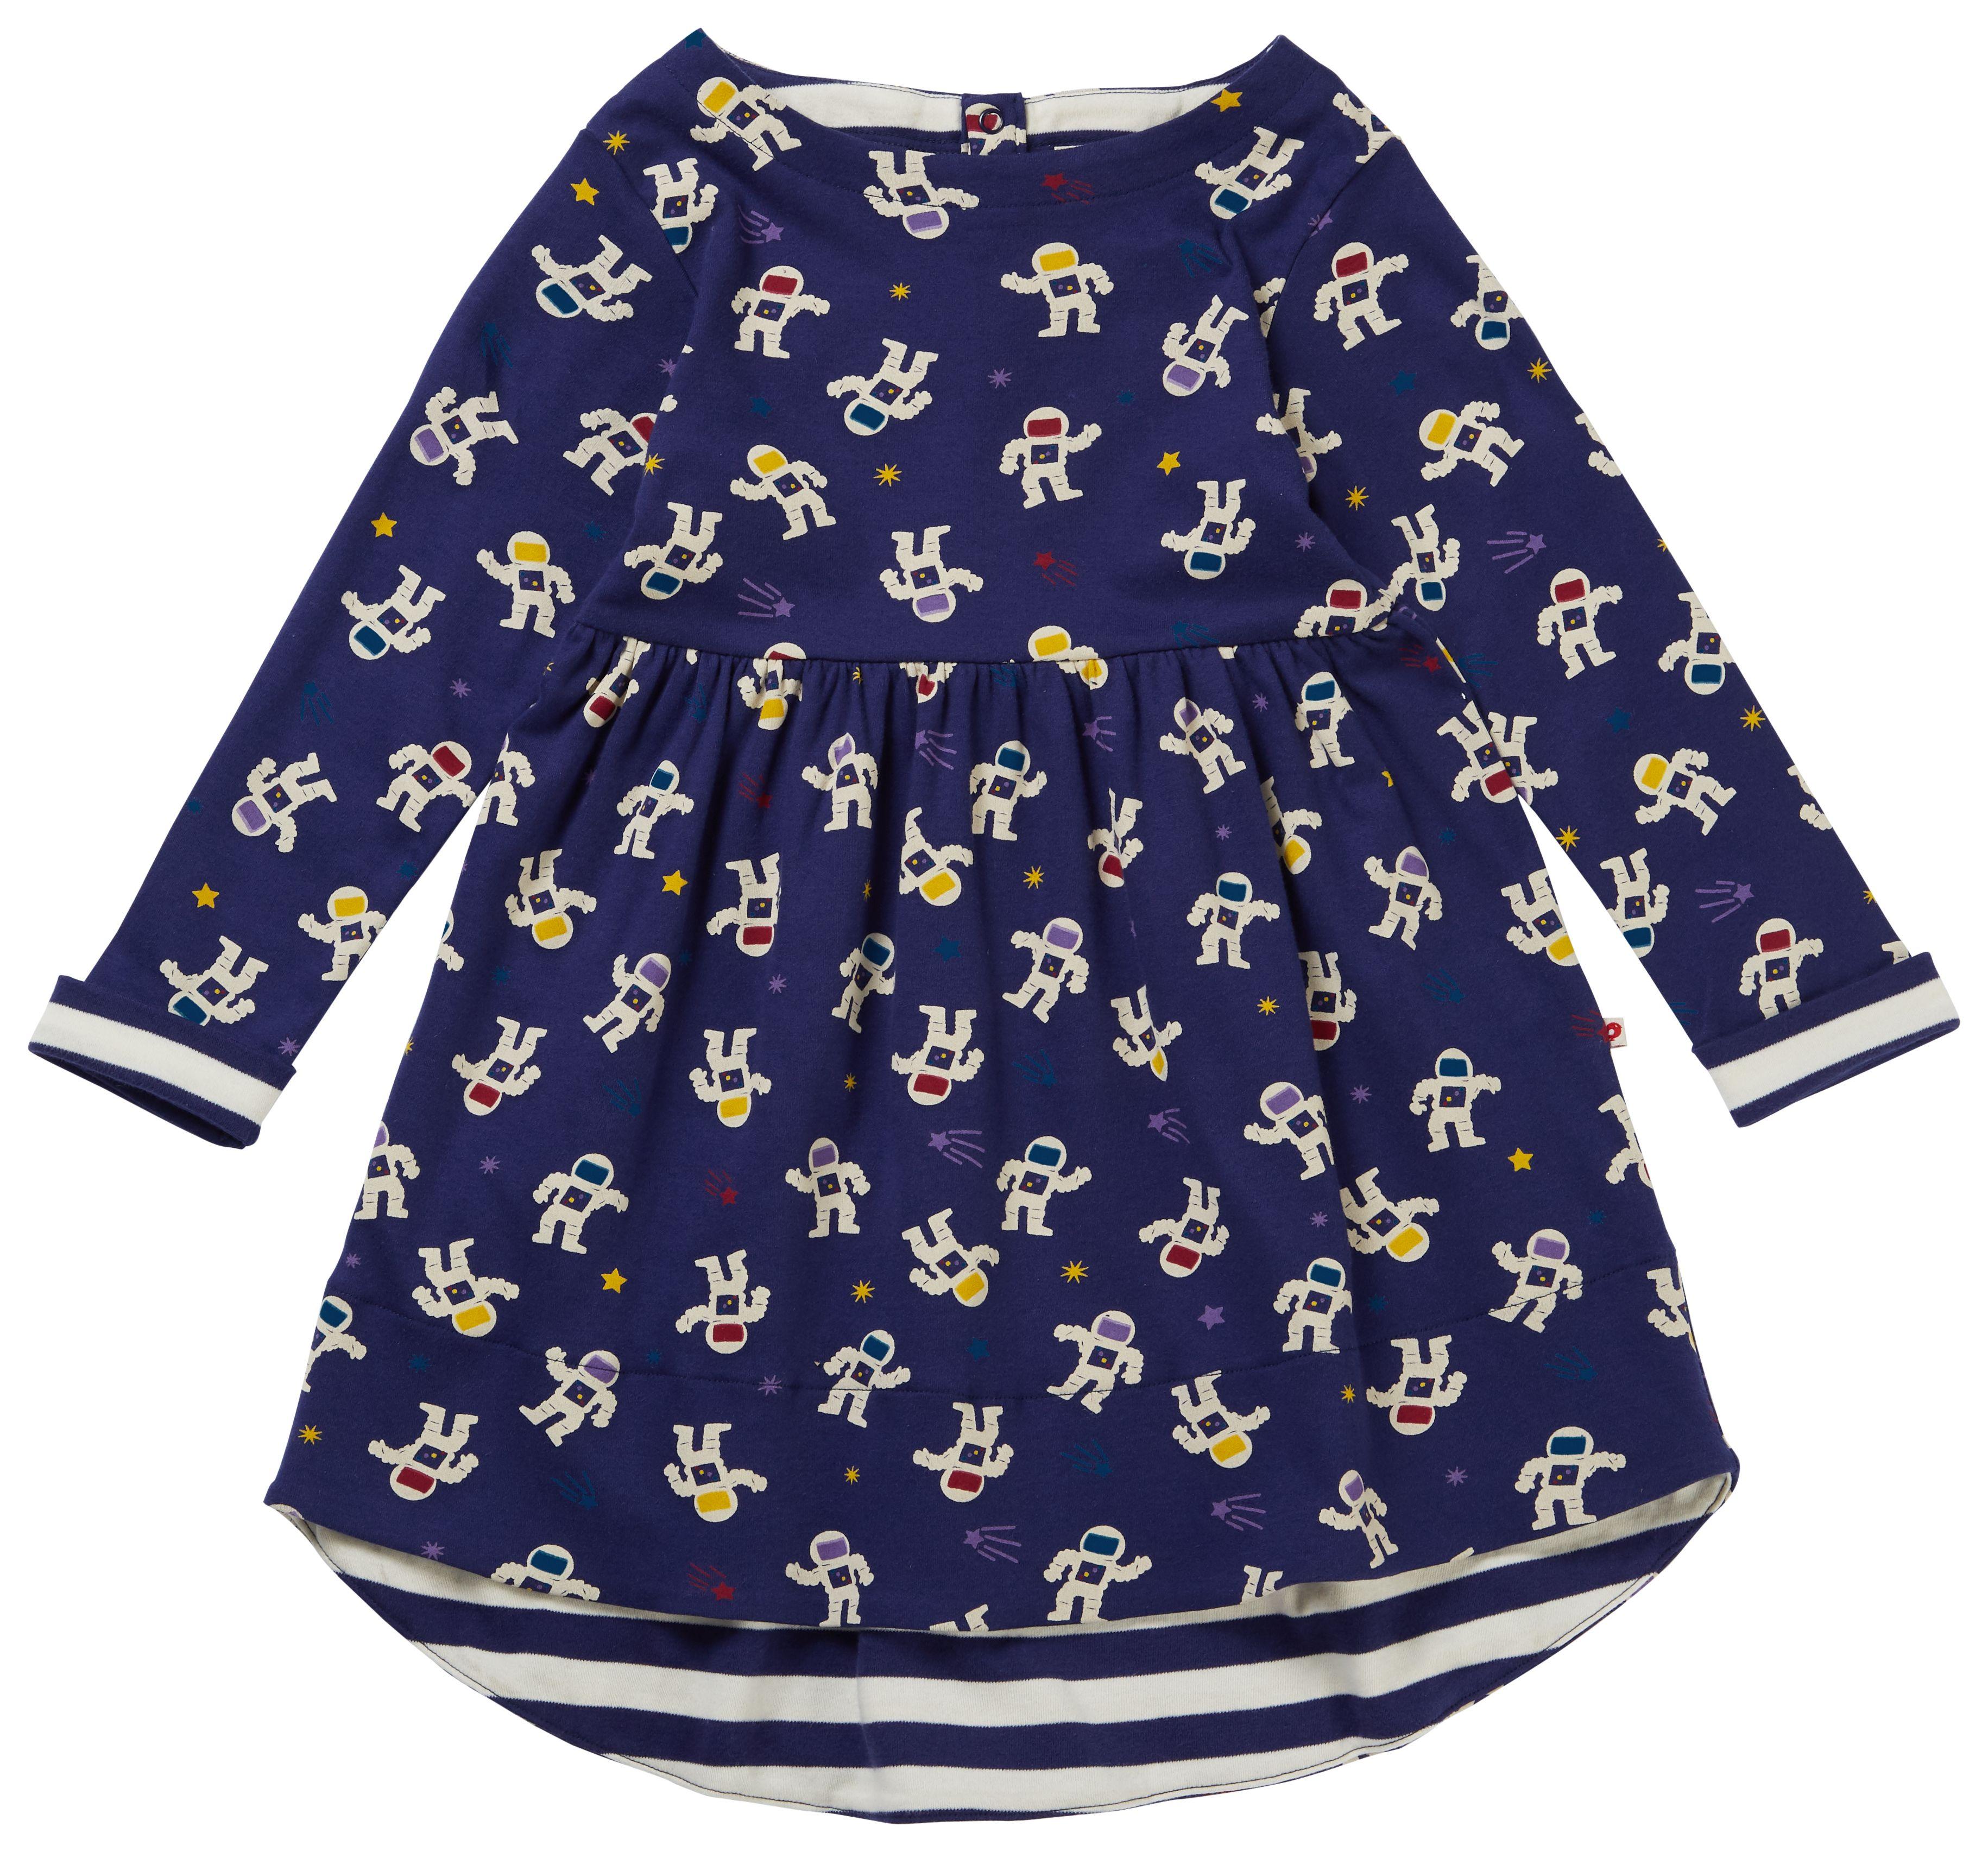 Kite Clothing Organic Cotton Baby Girl Body Dress Floral Print